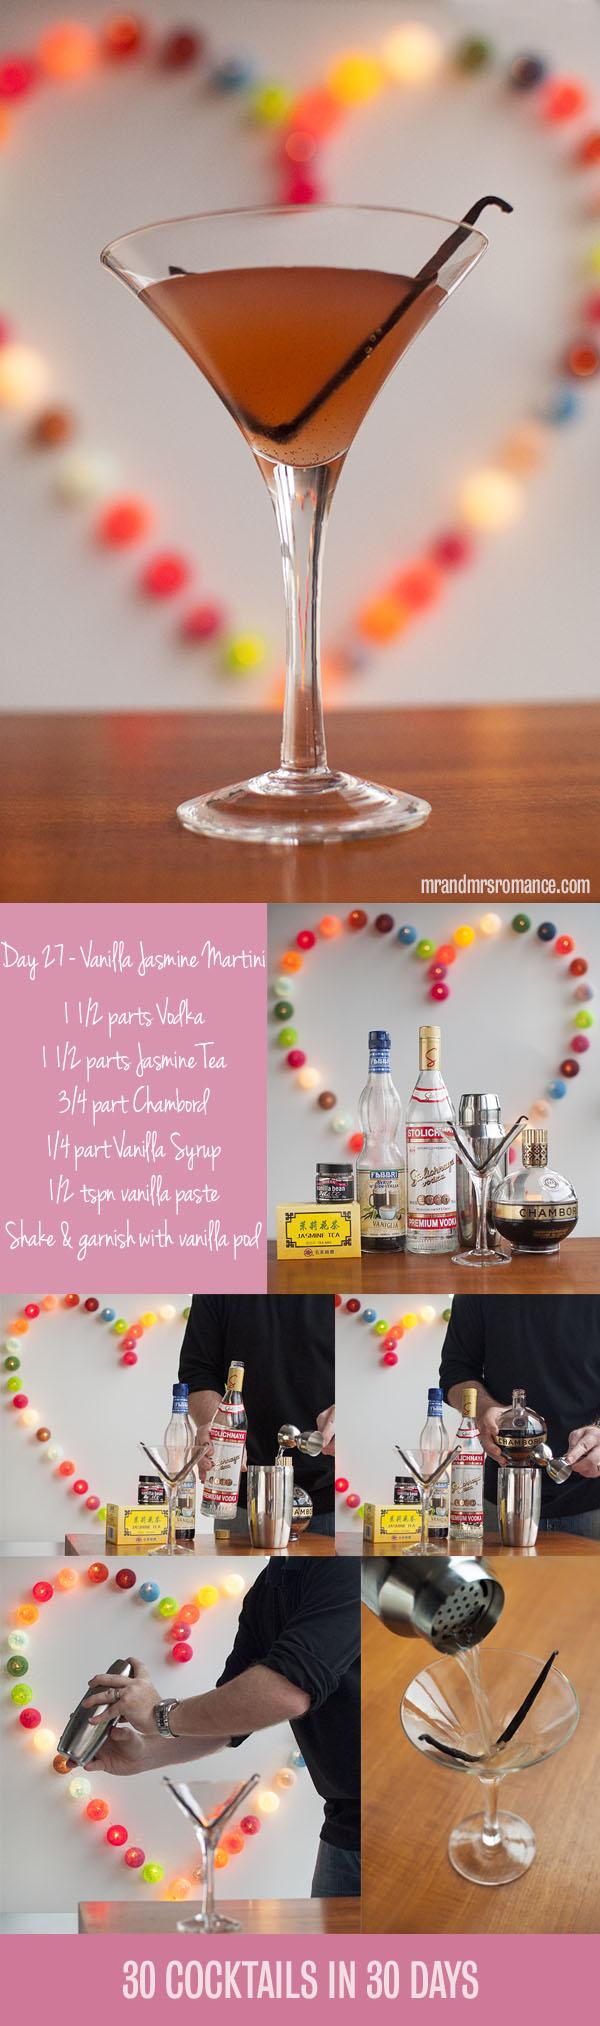 Mr and Mrs Romance - Day 27 - The Vanilla Jasmine Martini Cocktail Recipe